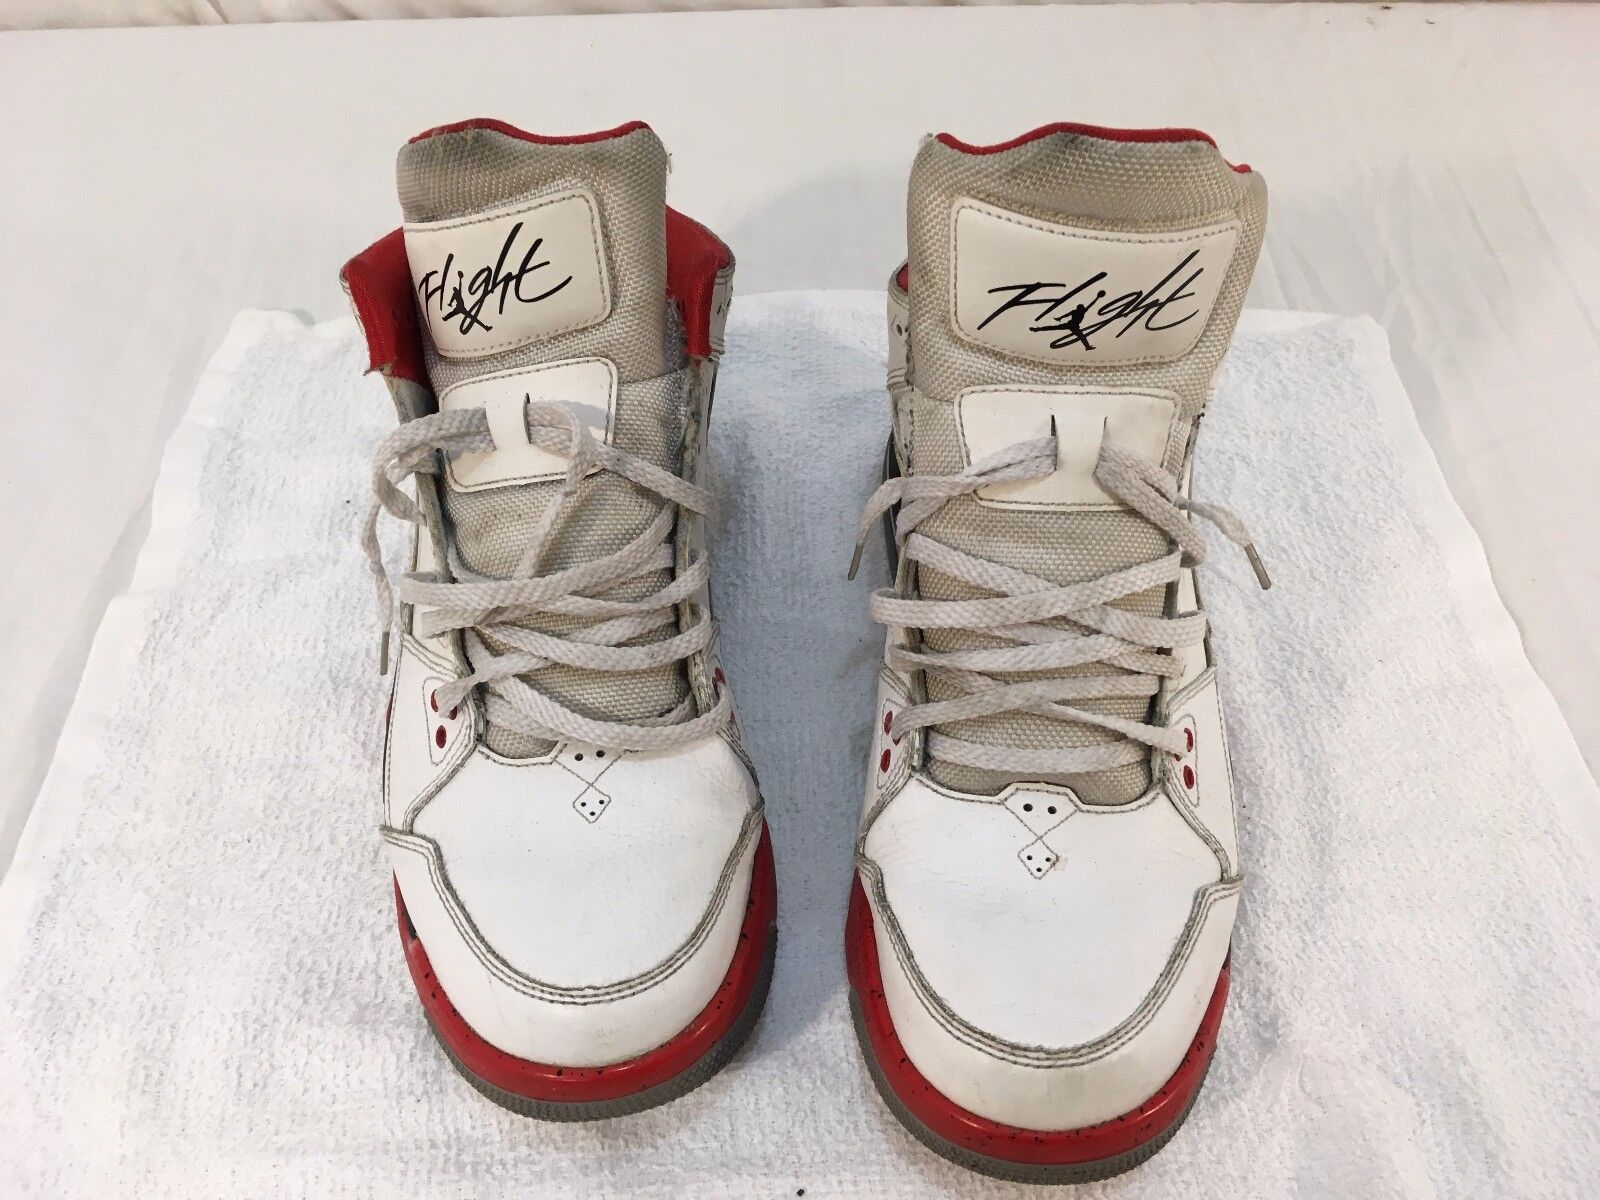 hombre Nike Air Jordans vuelo de rojo blanco negro zapatos de vuelo baloncesto de 10 Athletic 445c60